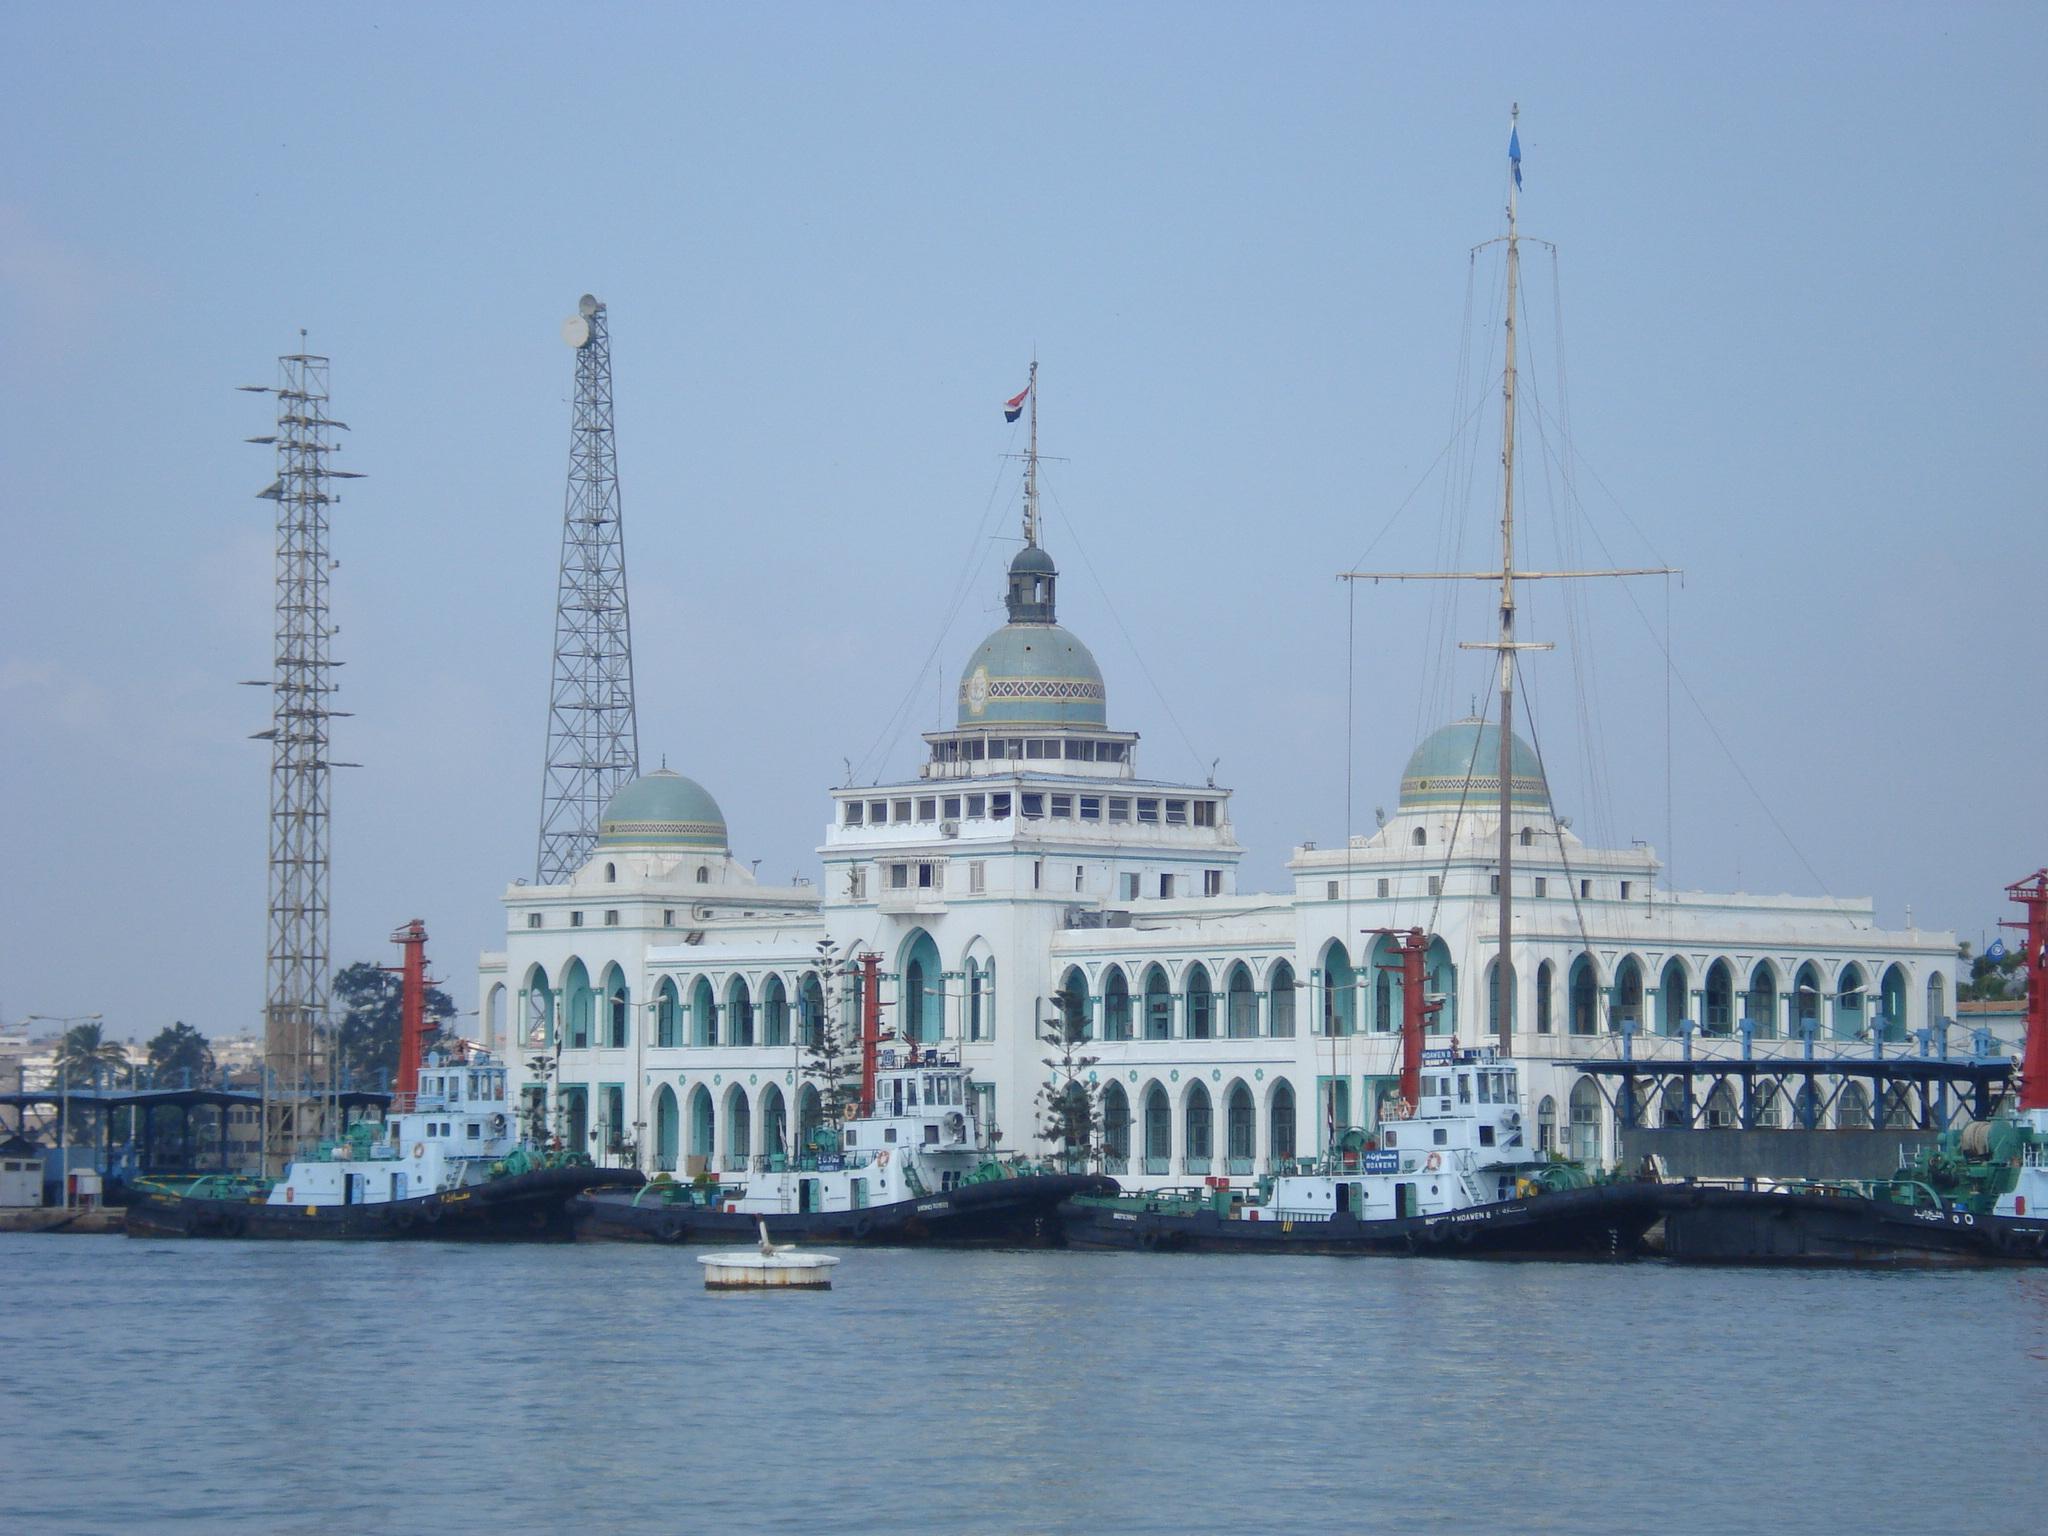 Building of Suez Canal Authority. fot. wikimedia/ Abdelrhman